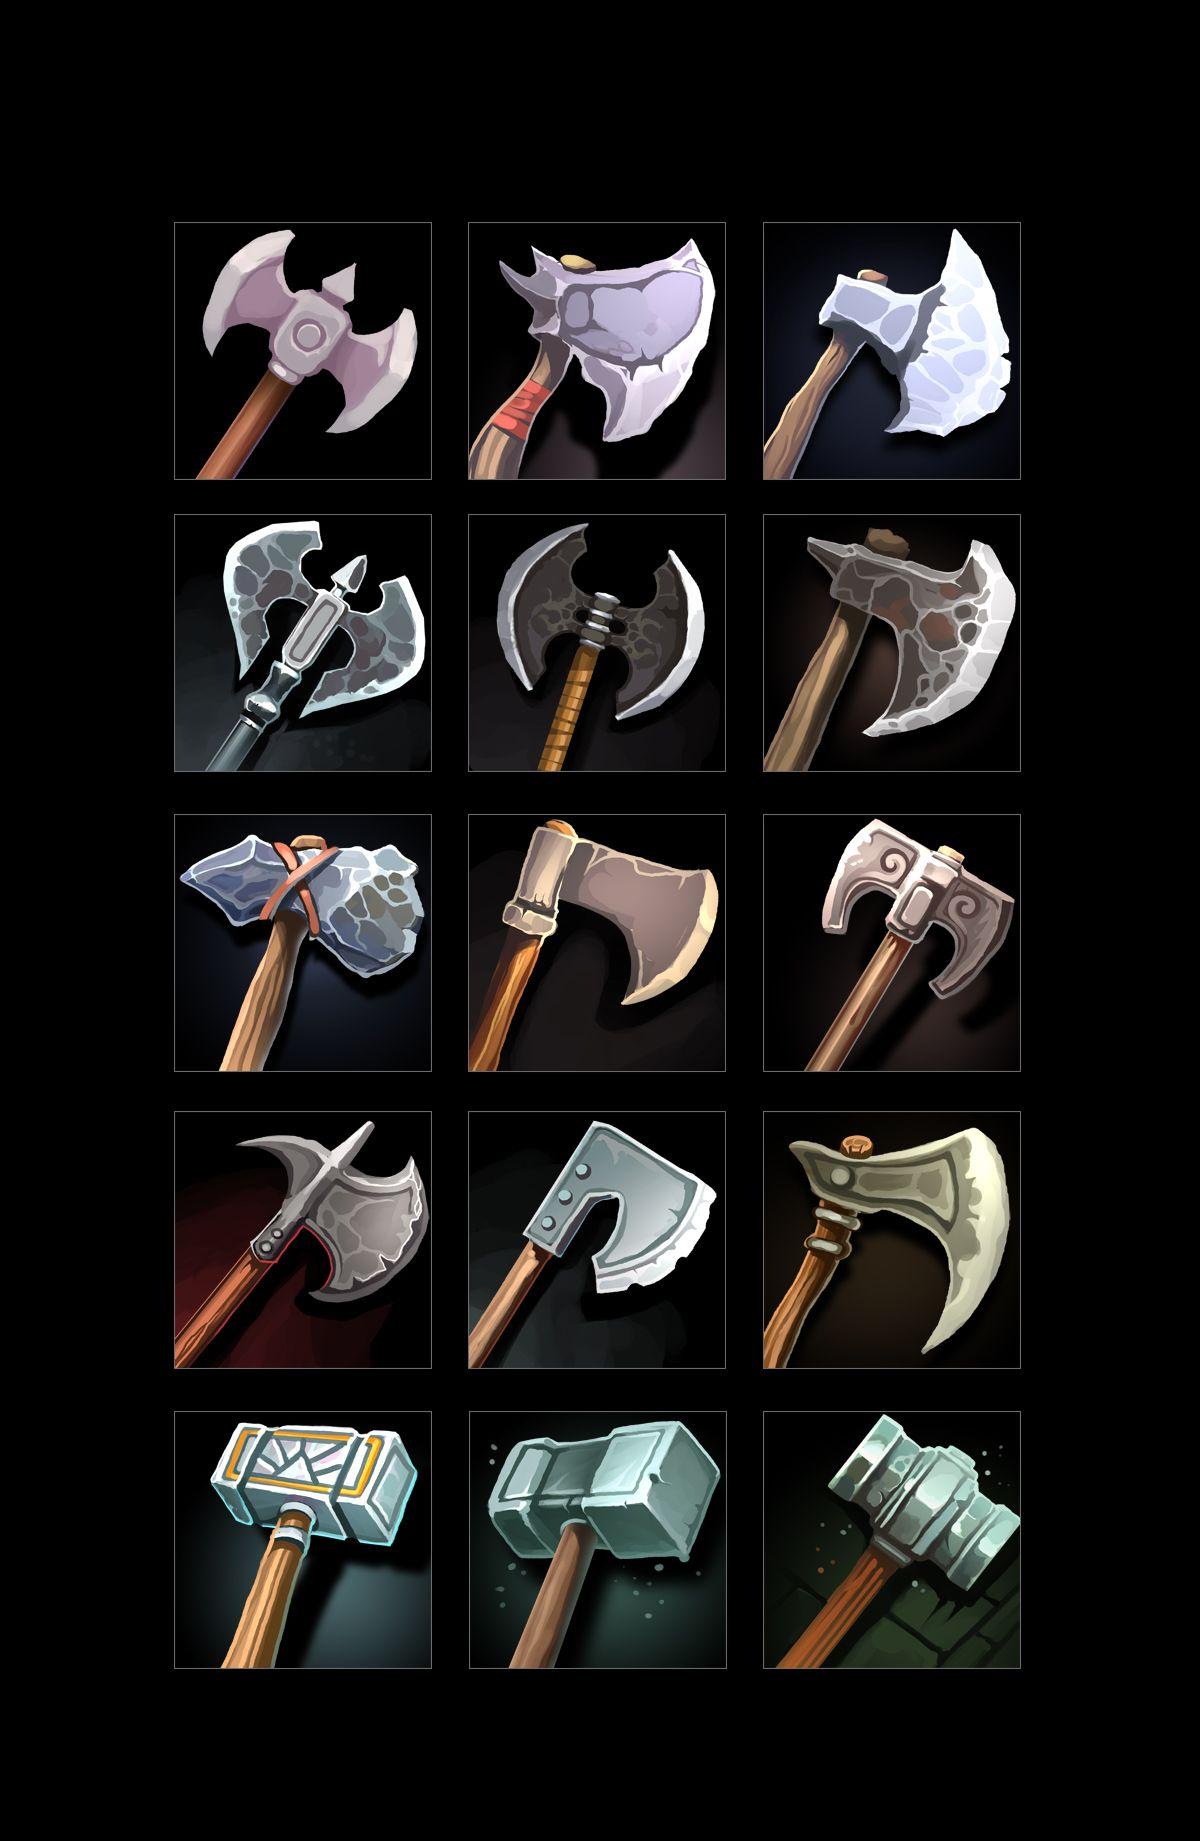 RPG Weapon Icons 2020 게임 아이콘, 아이콘, 게임